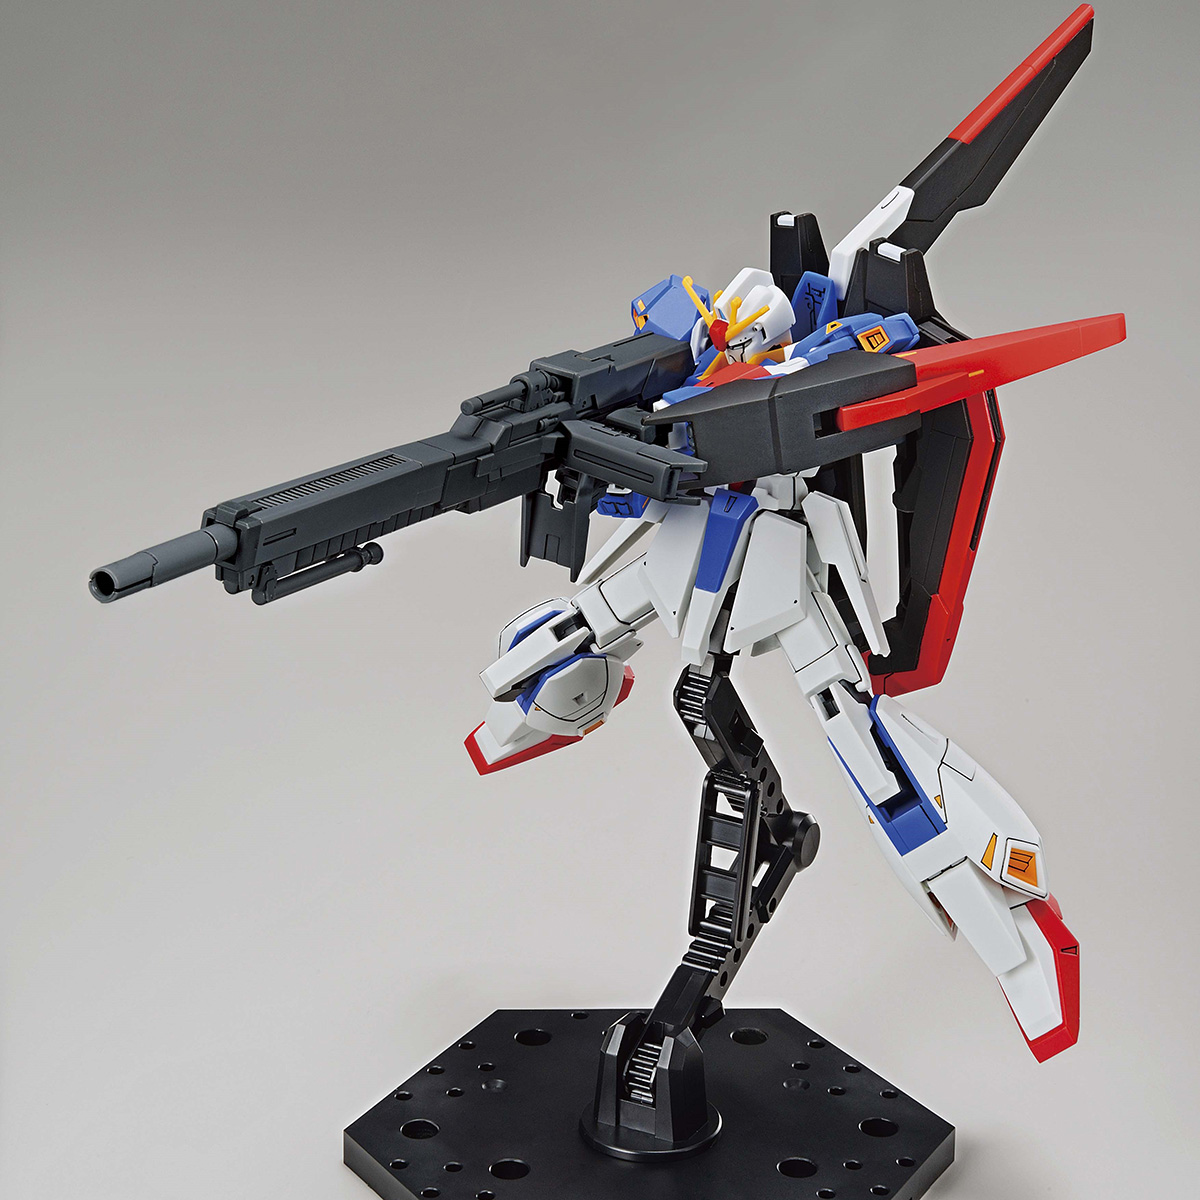 1/144 THE GUNDAM BASE LIMITED SYSTEM WEAPON KIT 008